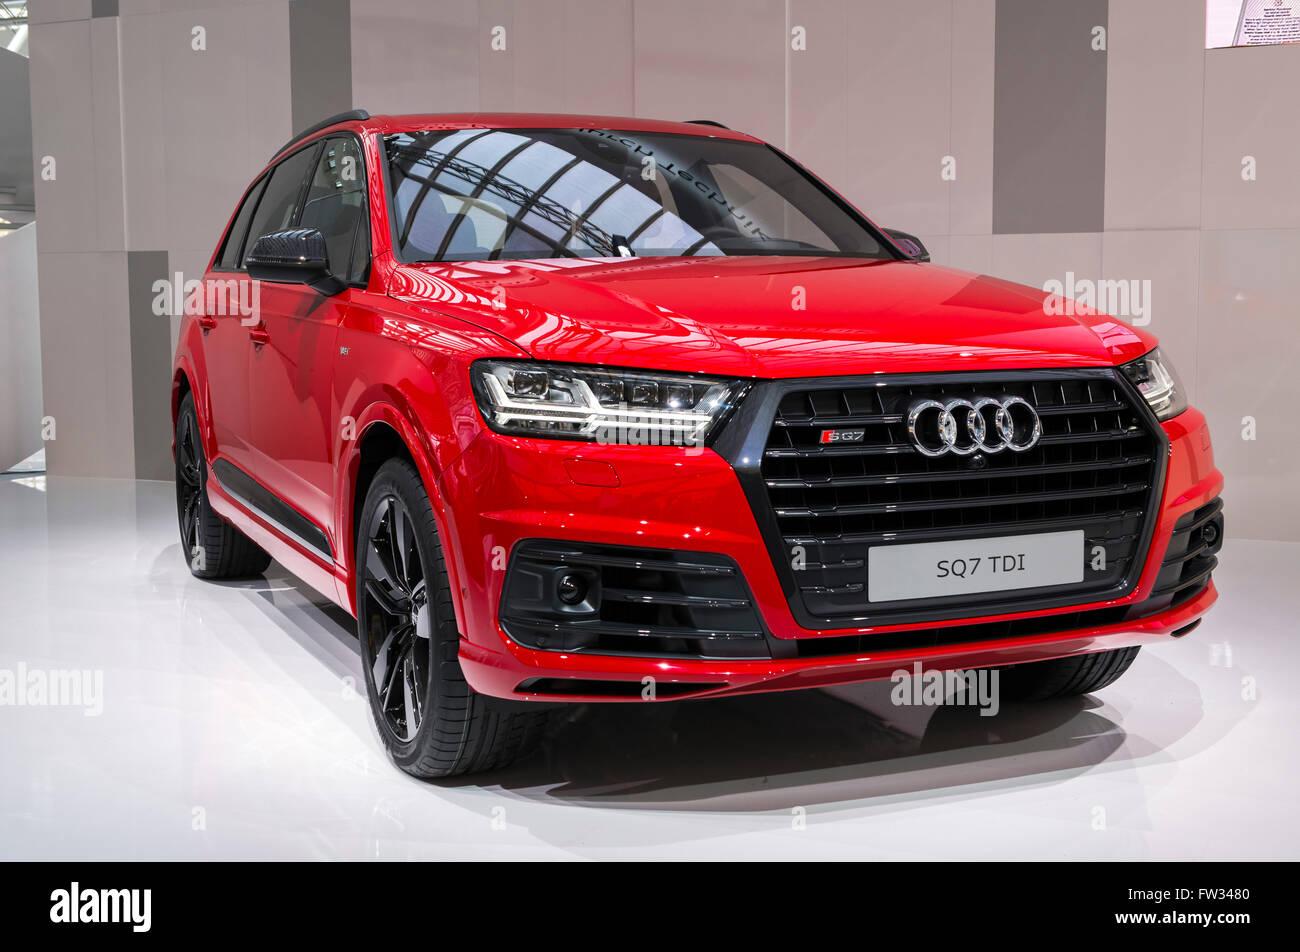 Audi audi sq7 tdi : Audi SQ7 TDI, built in 2016, Audi Forum event, Ingolstadt, Bavaria ...